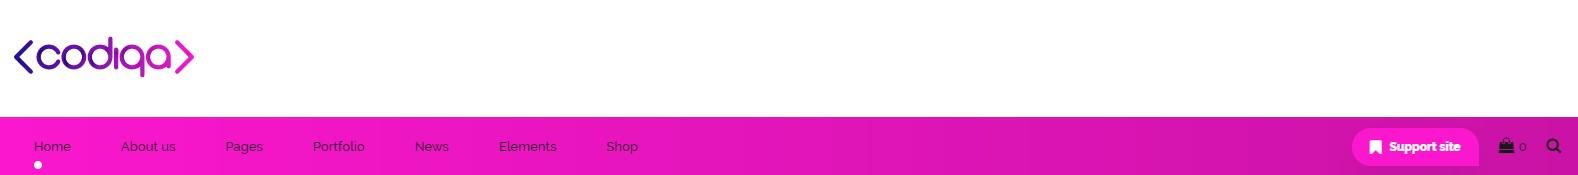 https://documentation.bold-themes.com/codiqa/wp-content/uploads/sites/49/2019/10/header-accent-light.jpg